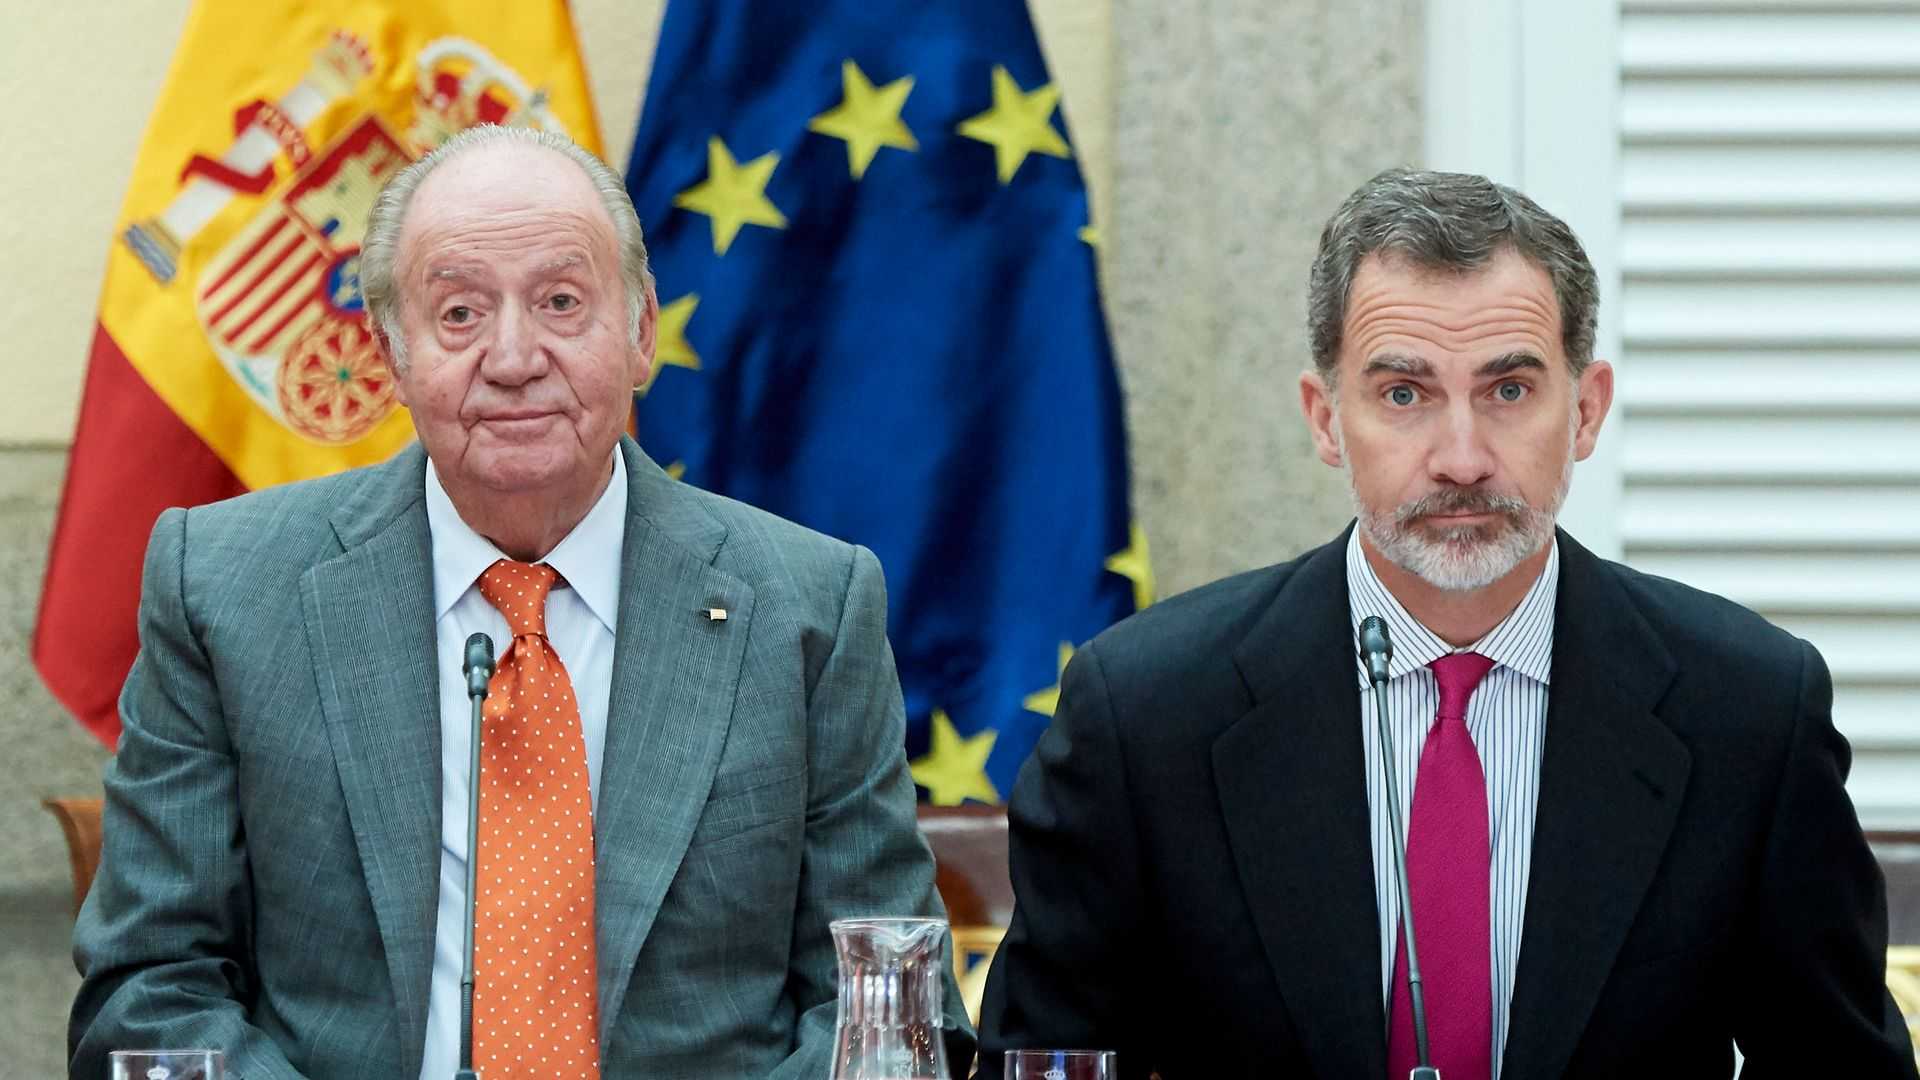 King Felipe VI of Spain (R) and King Juan Carlos (L) in May 2019 - Credit: Photo by Carlos Alvarez/Getty Images